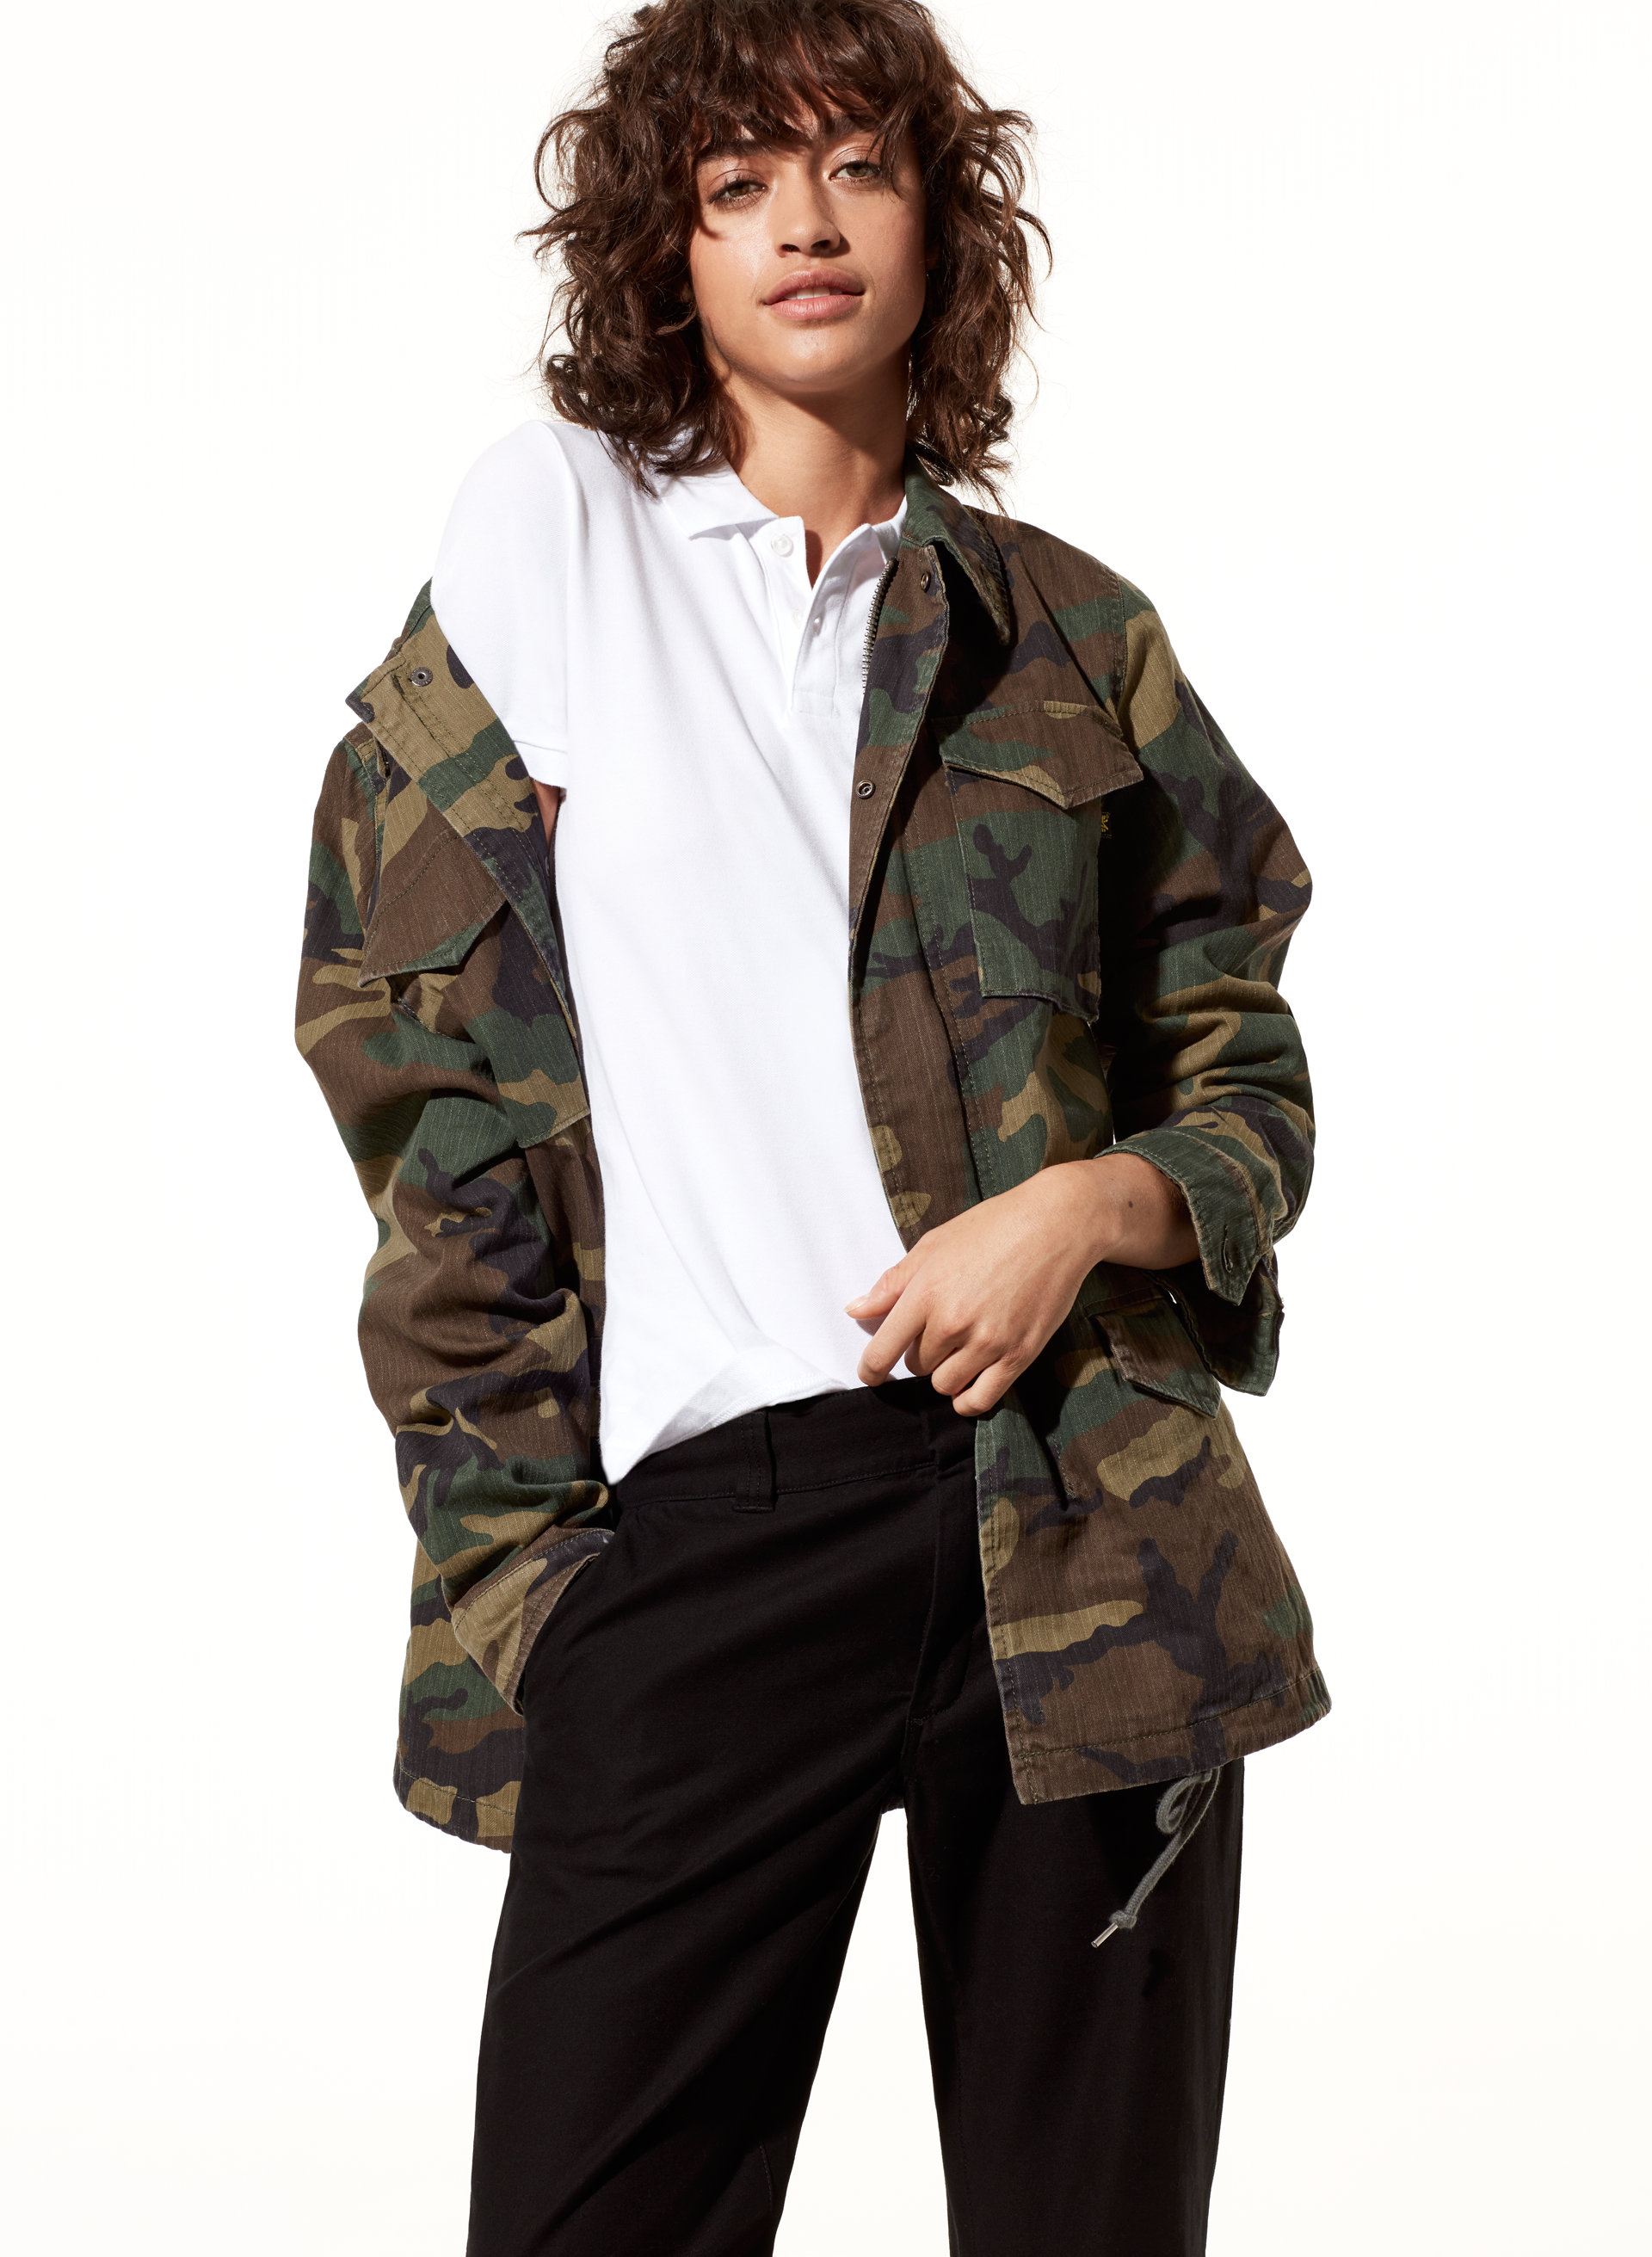 military style dress jacket vs coat